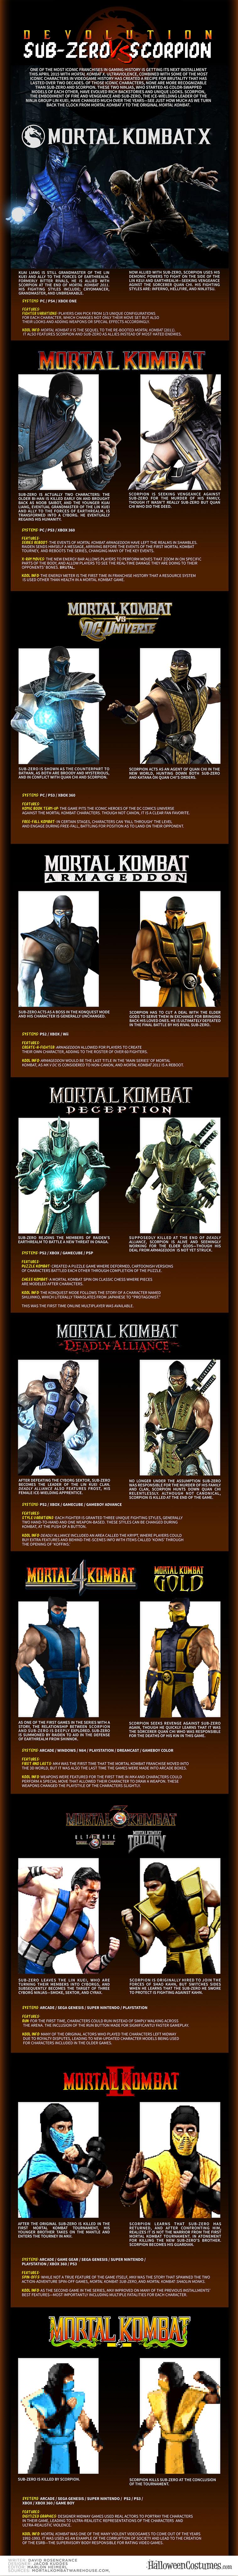 Mortal Kombat Devolution of Sub-Zero and Scorpion Infographic